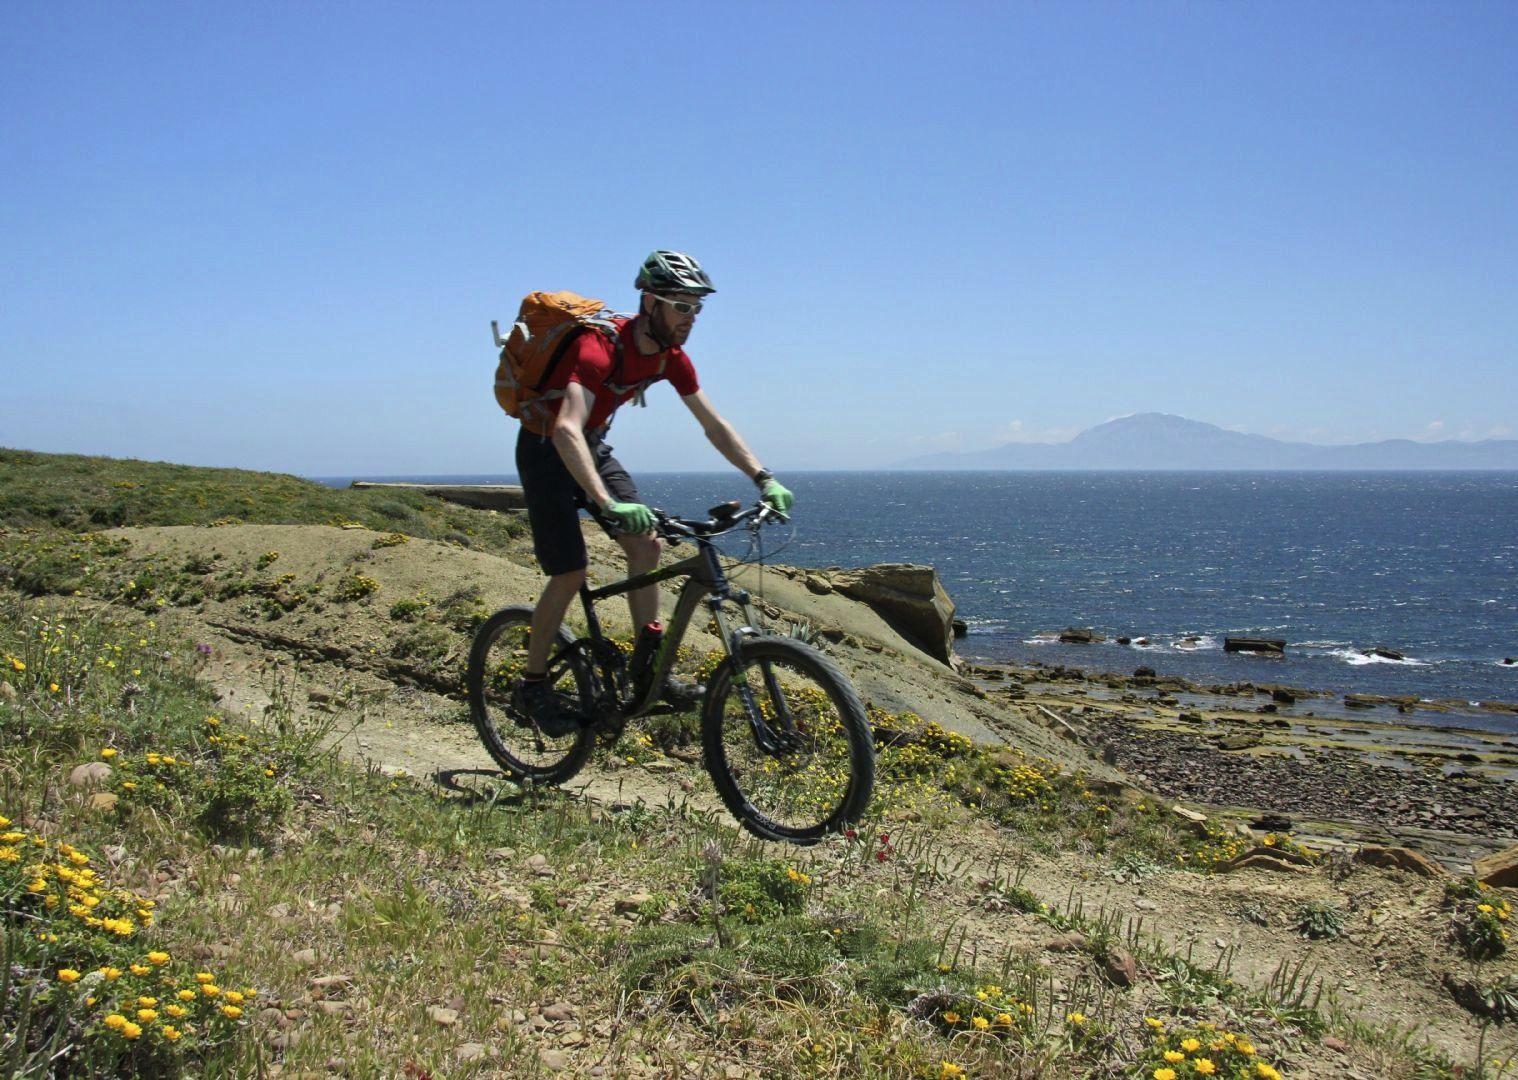 _Holiday.294.7671_full.jpg - Spain - Trans Andaluz - Guided Mountain Bike Holiday - Mountain Biking